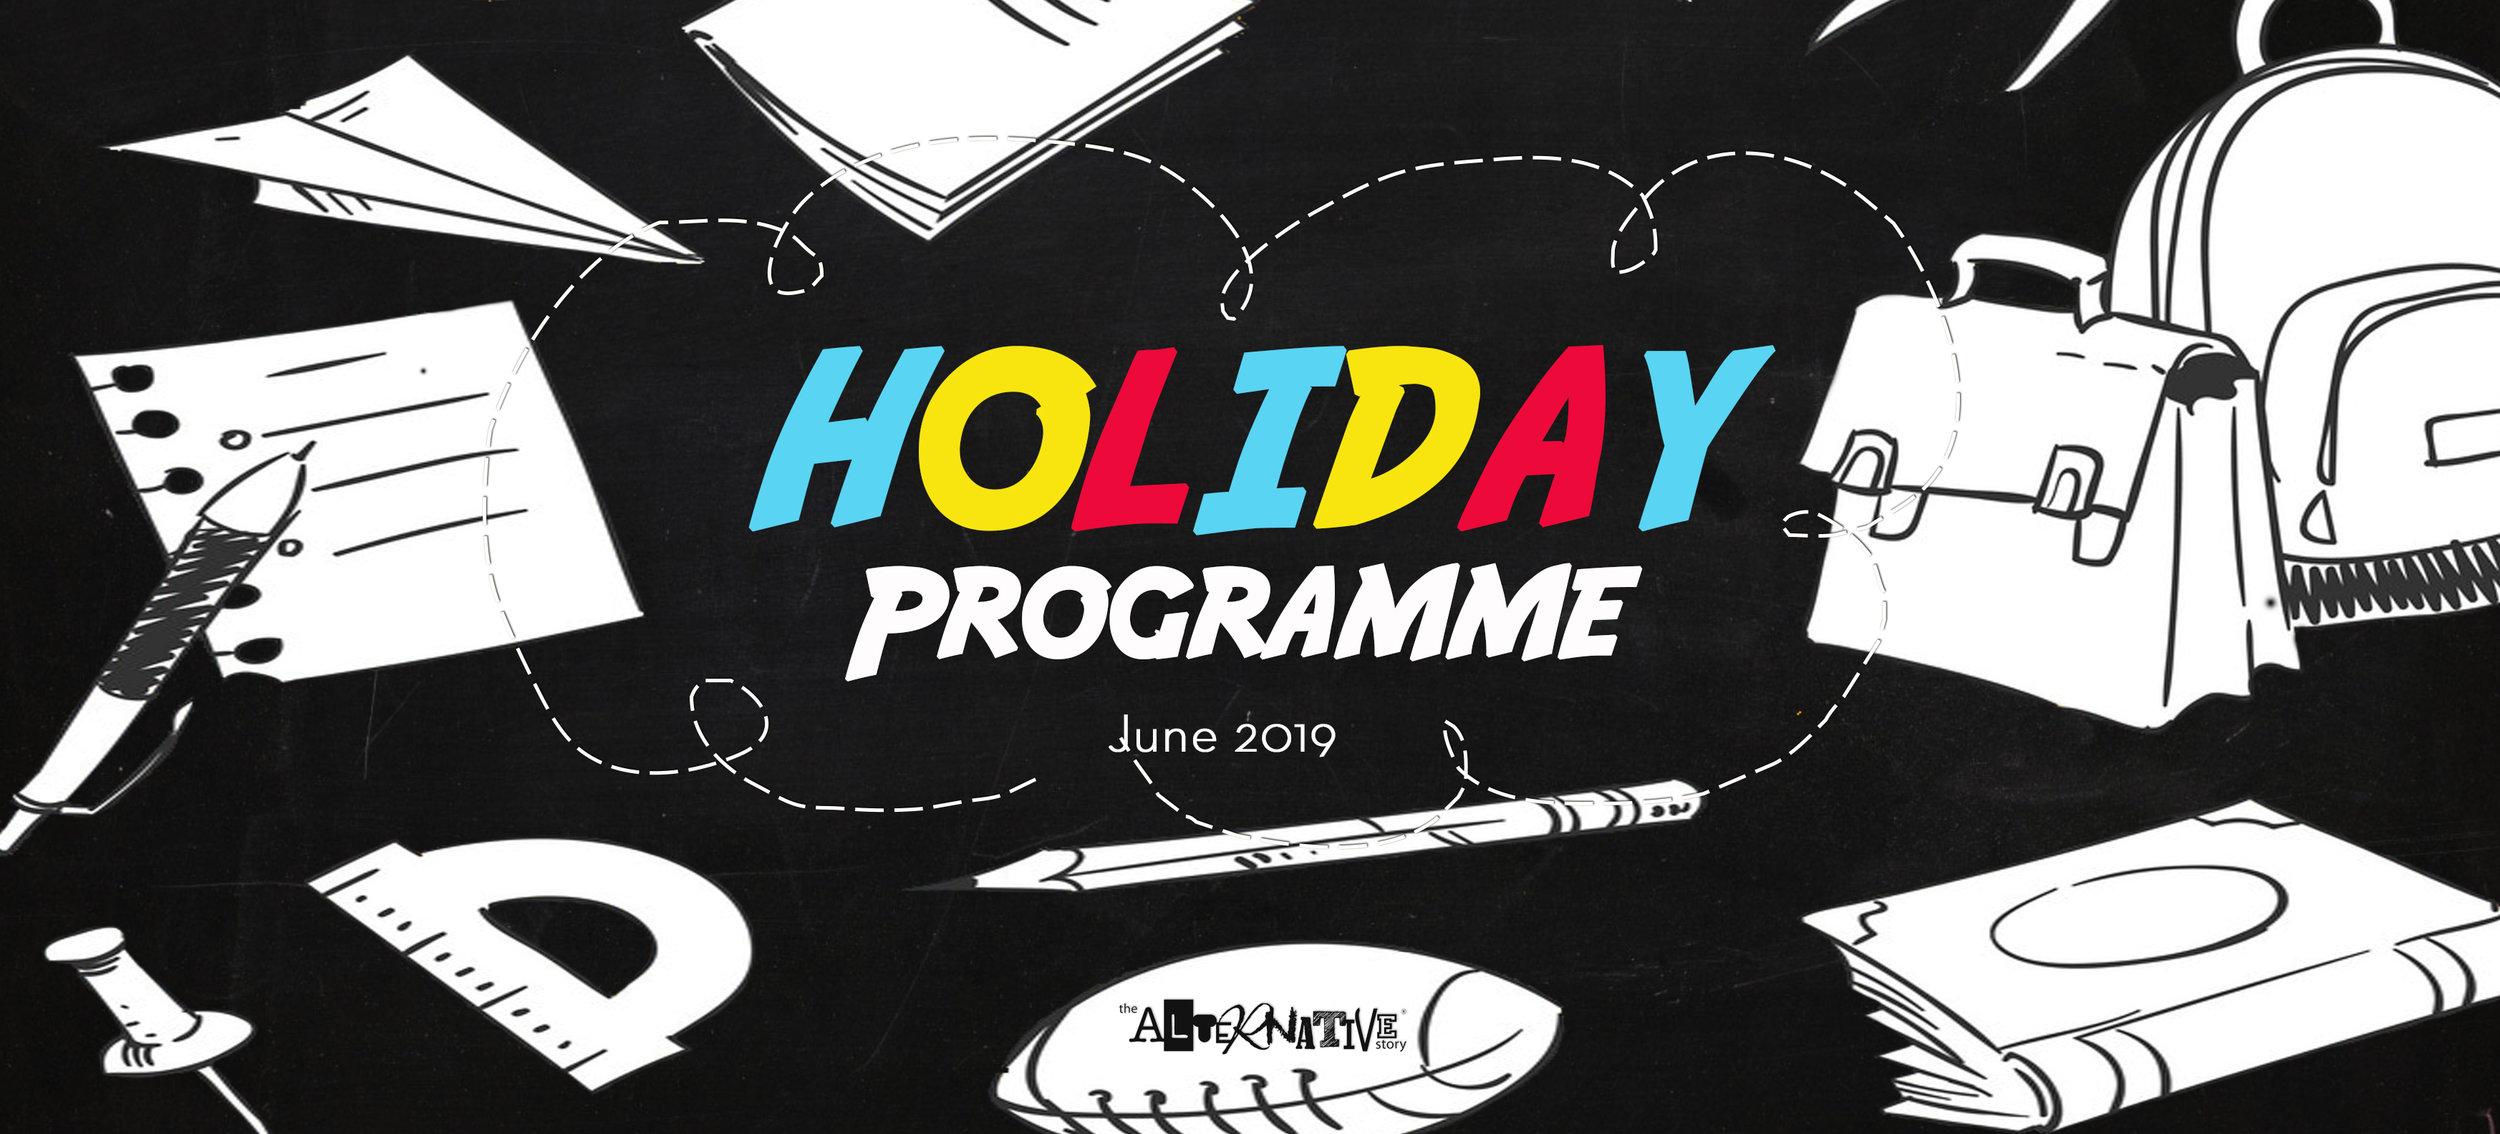 TAS Holiday Programme (June '19)